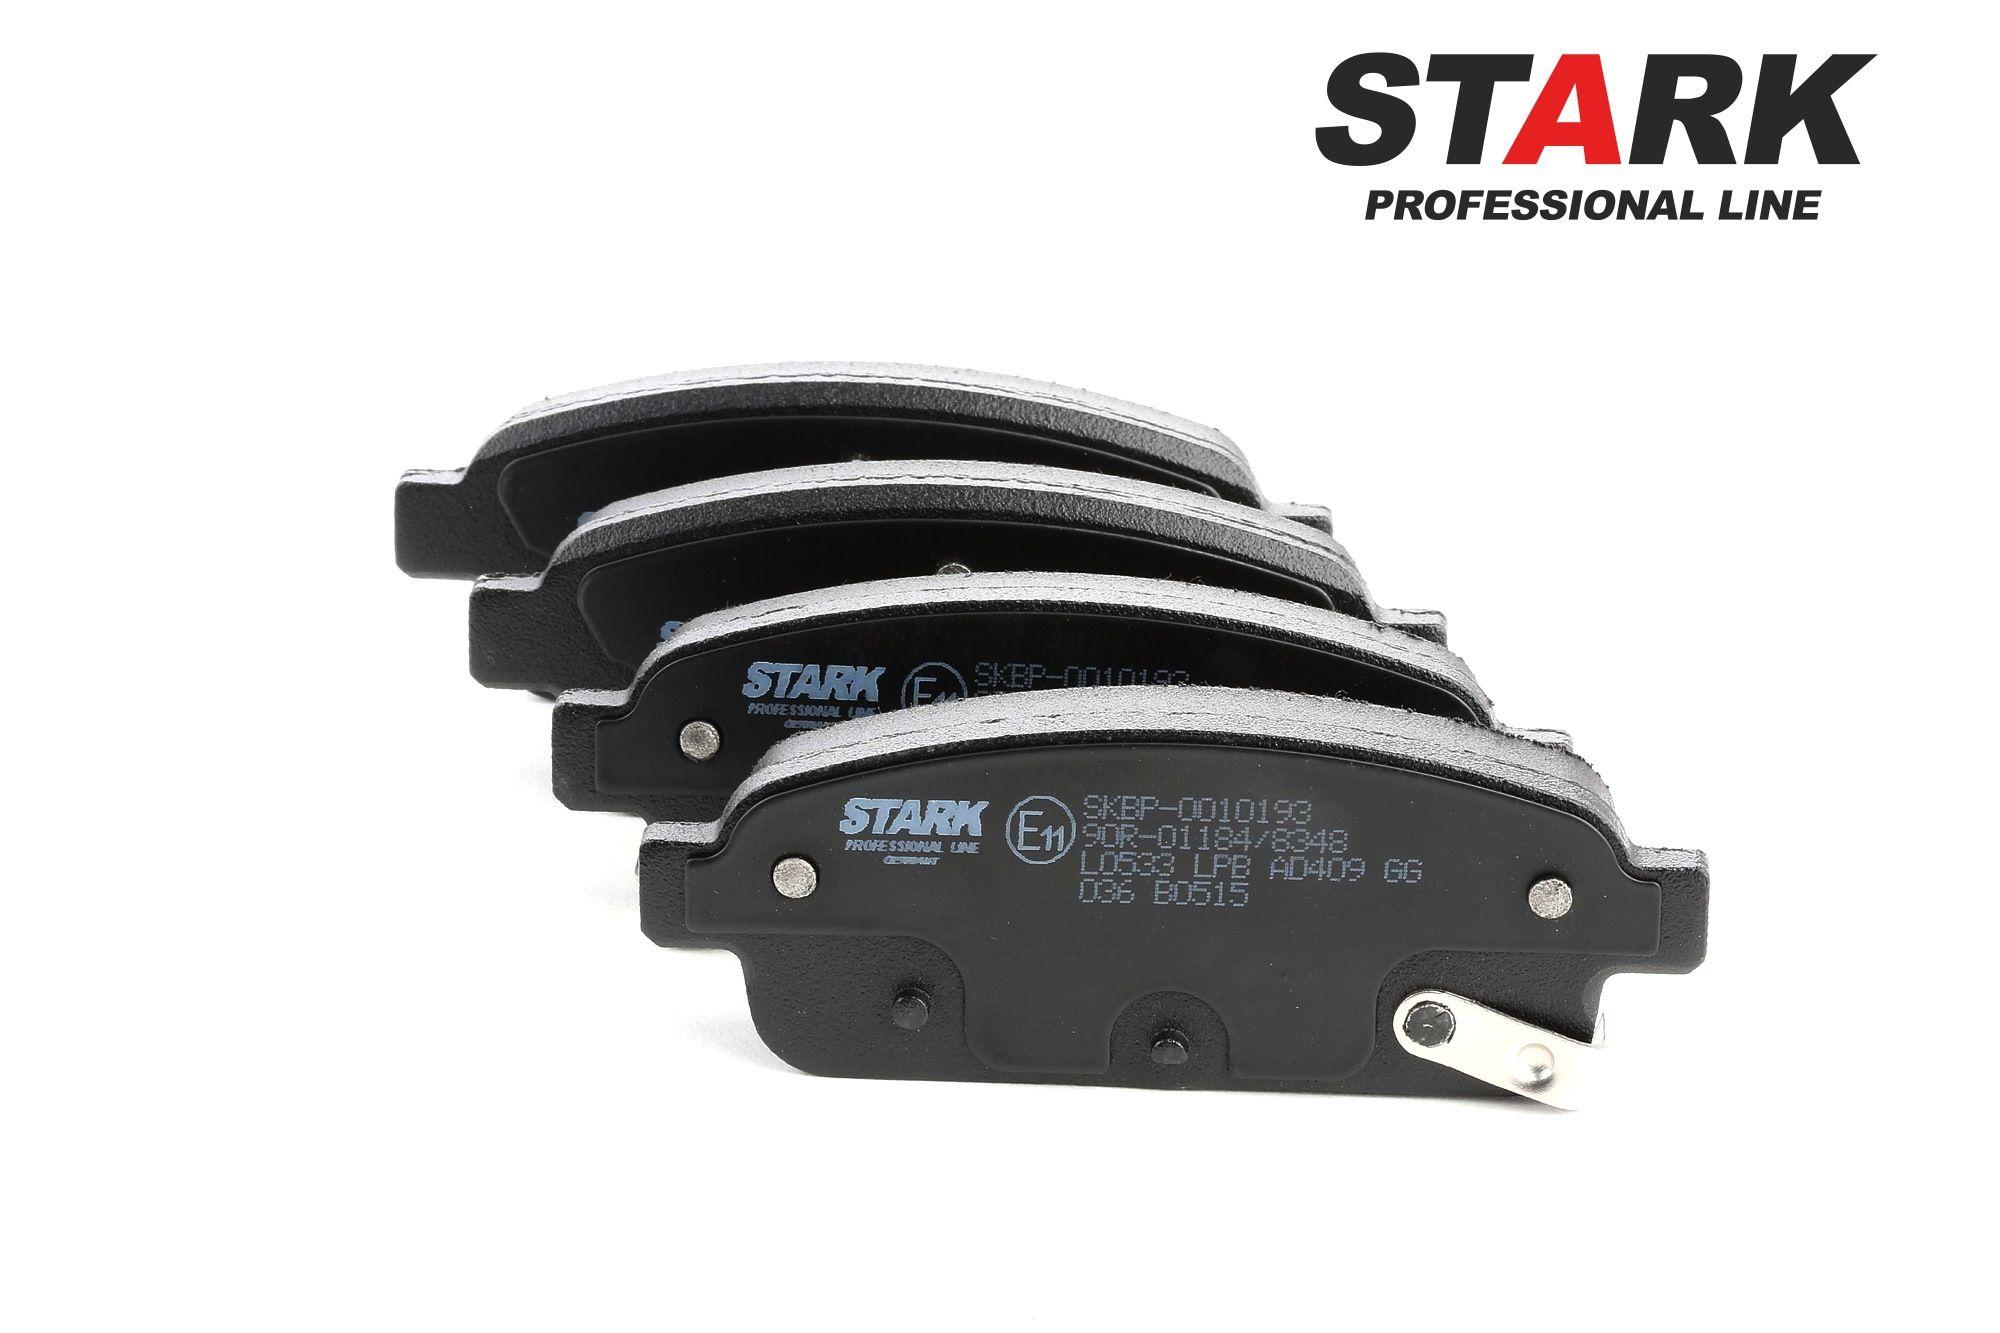 STARK %ART_NO_SYN_CLEAR% %DYNAMIC_AUTOPART_SYNONYM% Opel Astra j p10 2.0 CDTI 2014 131 PS - Premium Autoteile-Angebot